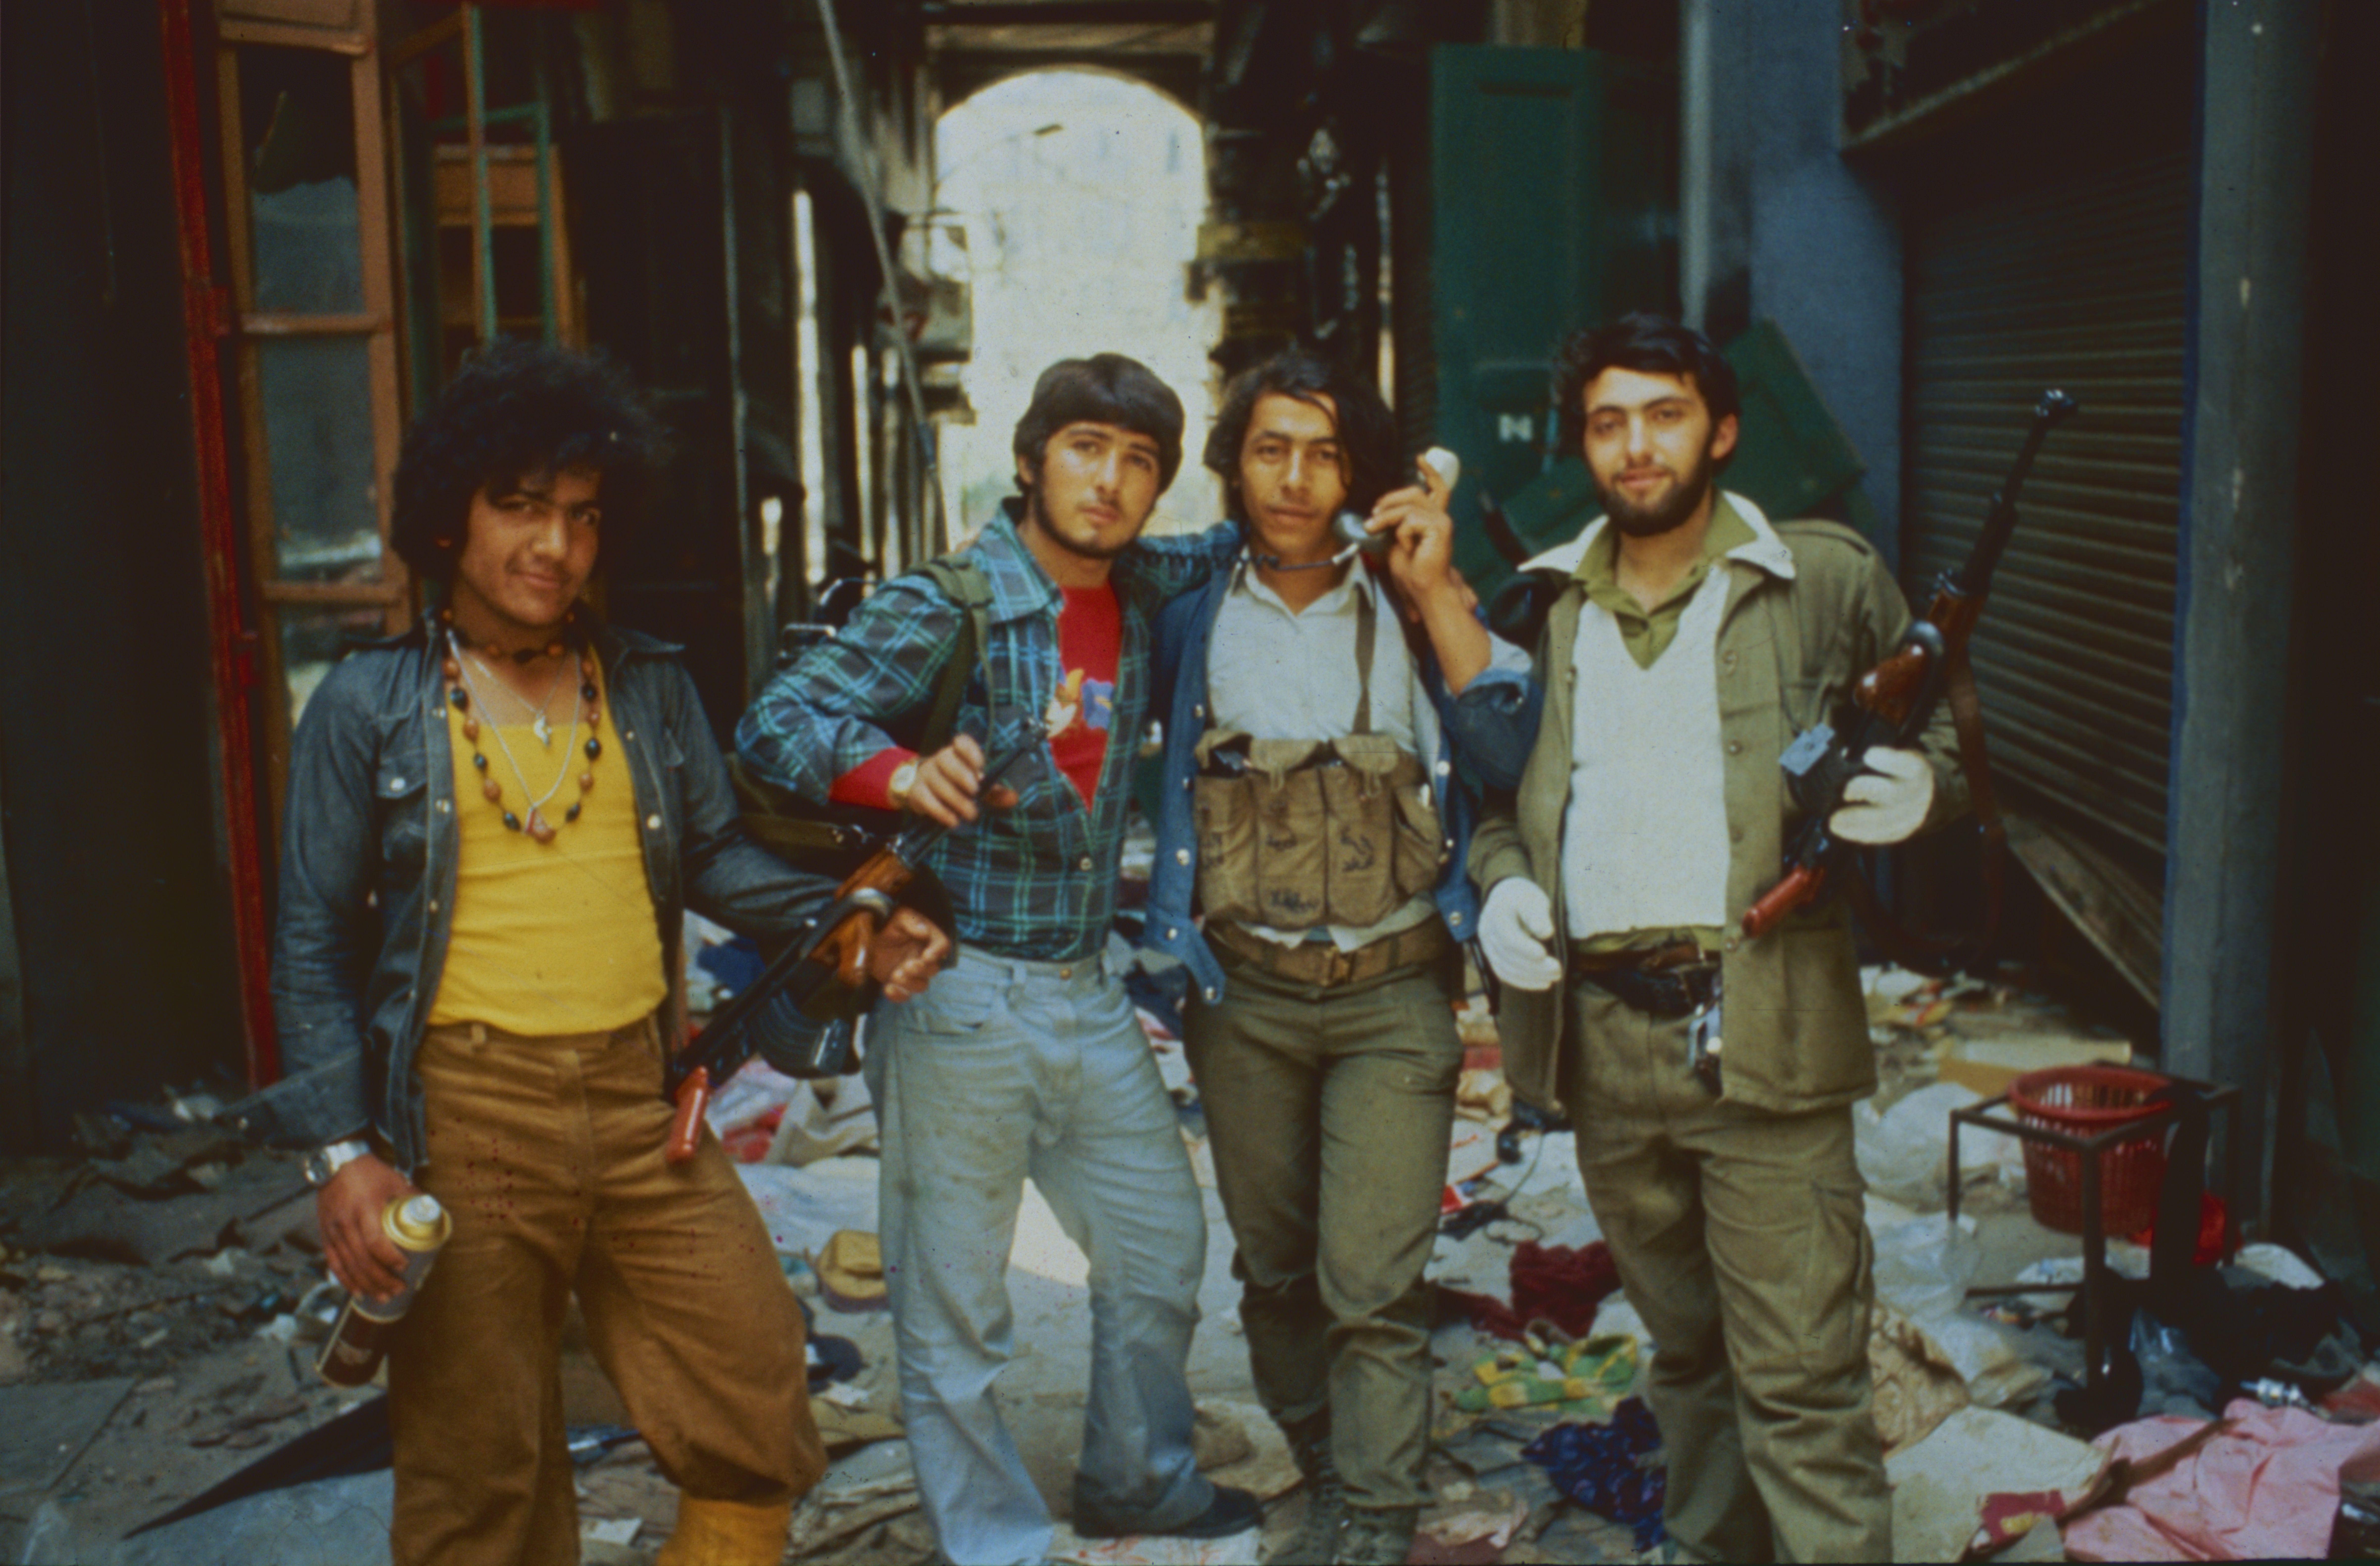 Les bandes armées Beyrouth